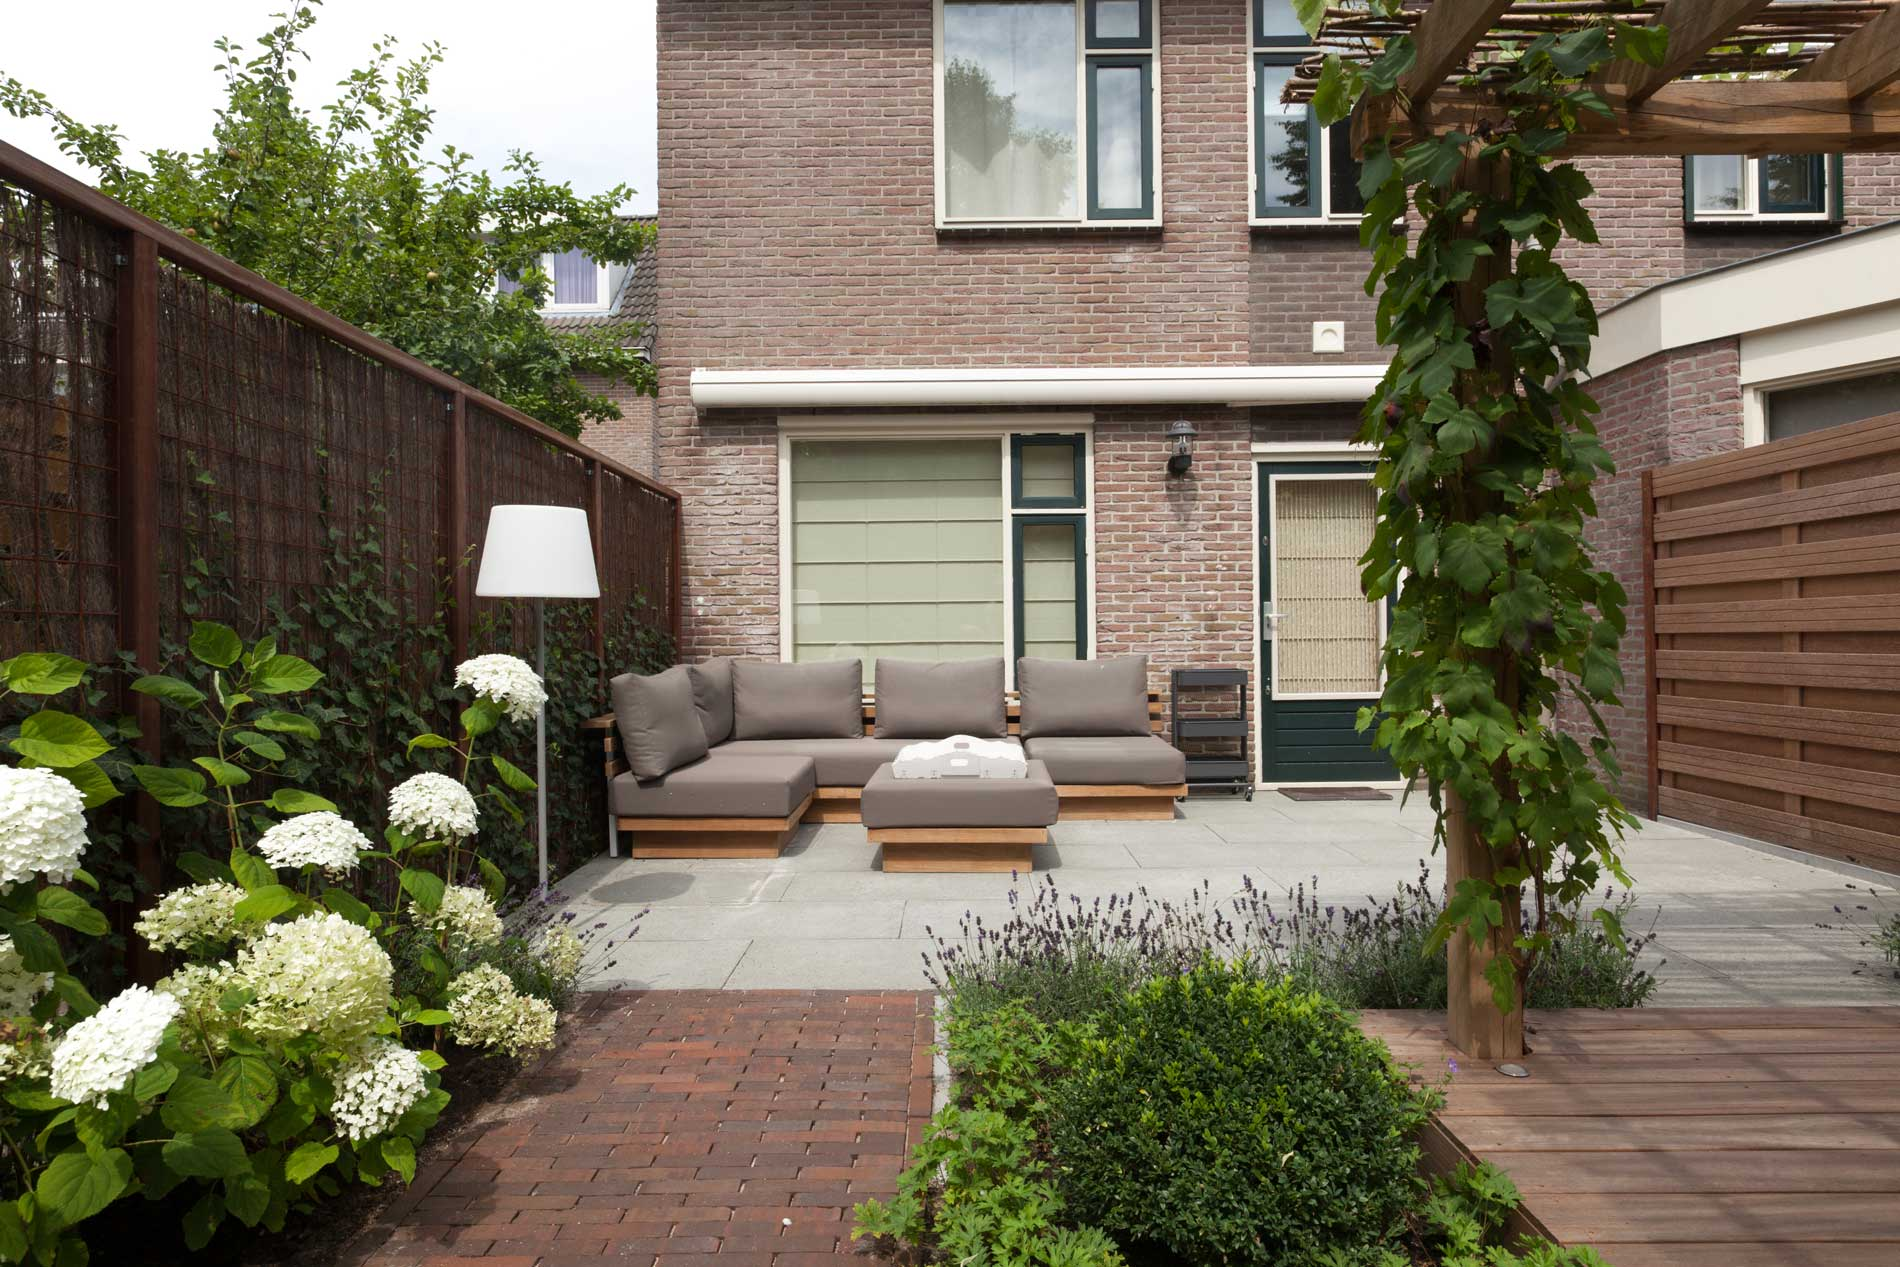 Franse tuin door heart for gardens laten ontwerpen of for Tuin laten ontwerpen